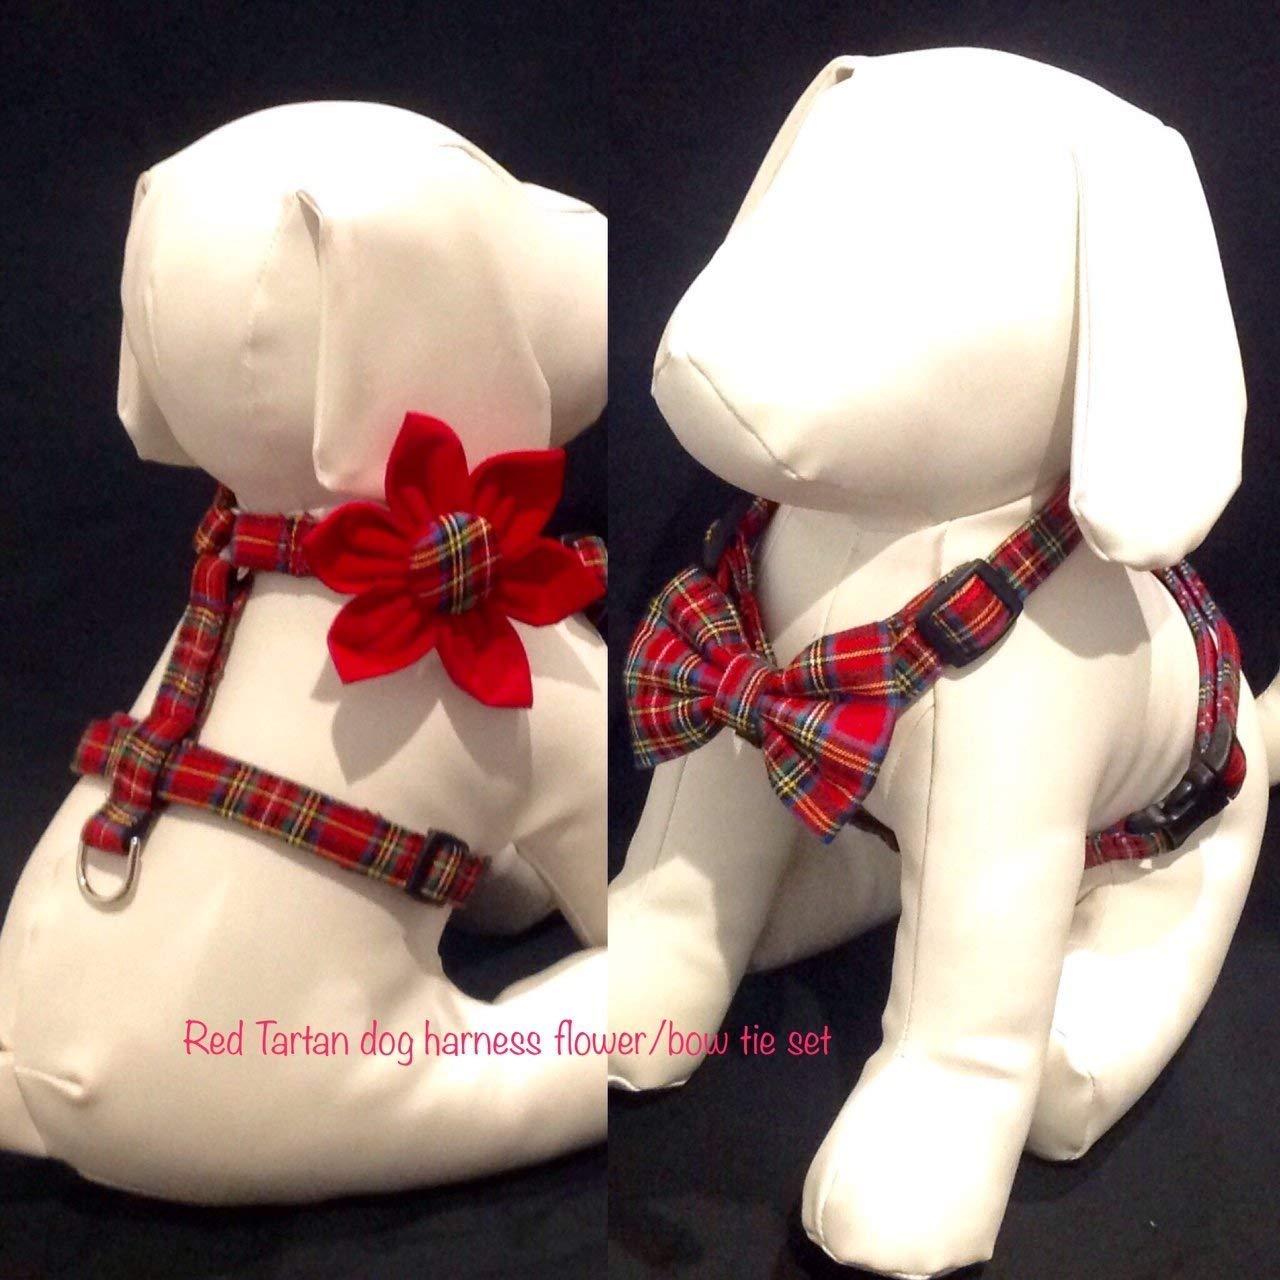 71M Ay3JwVL._SL1280_ amazon com dog harness flower bow tie set red tartan sizes xs